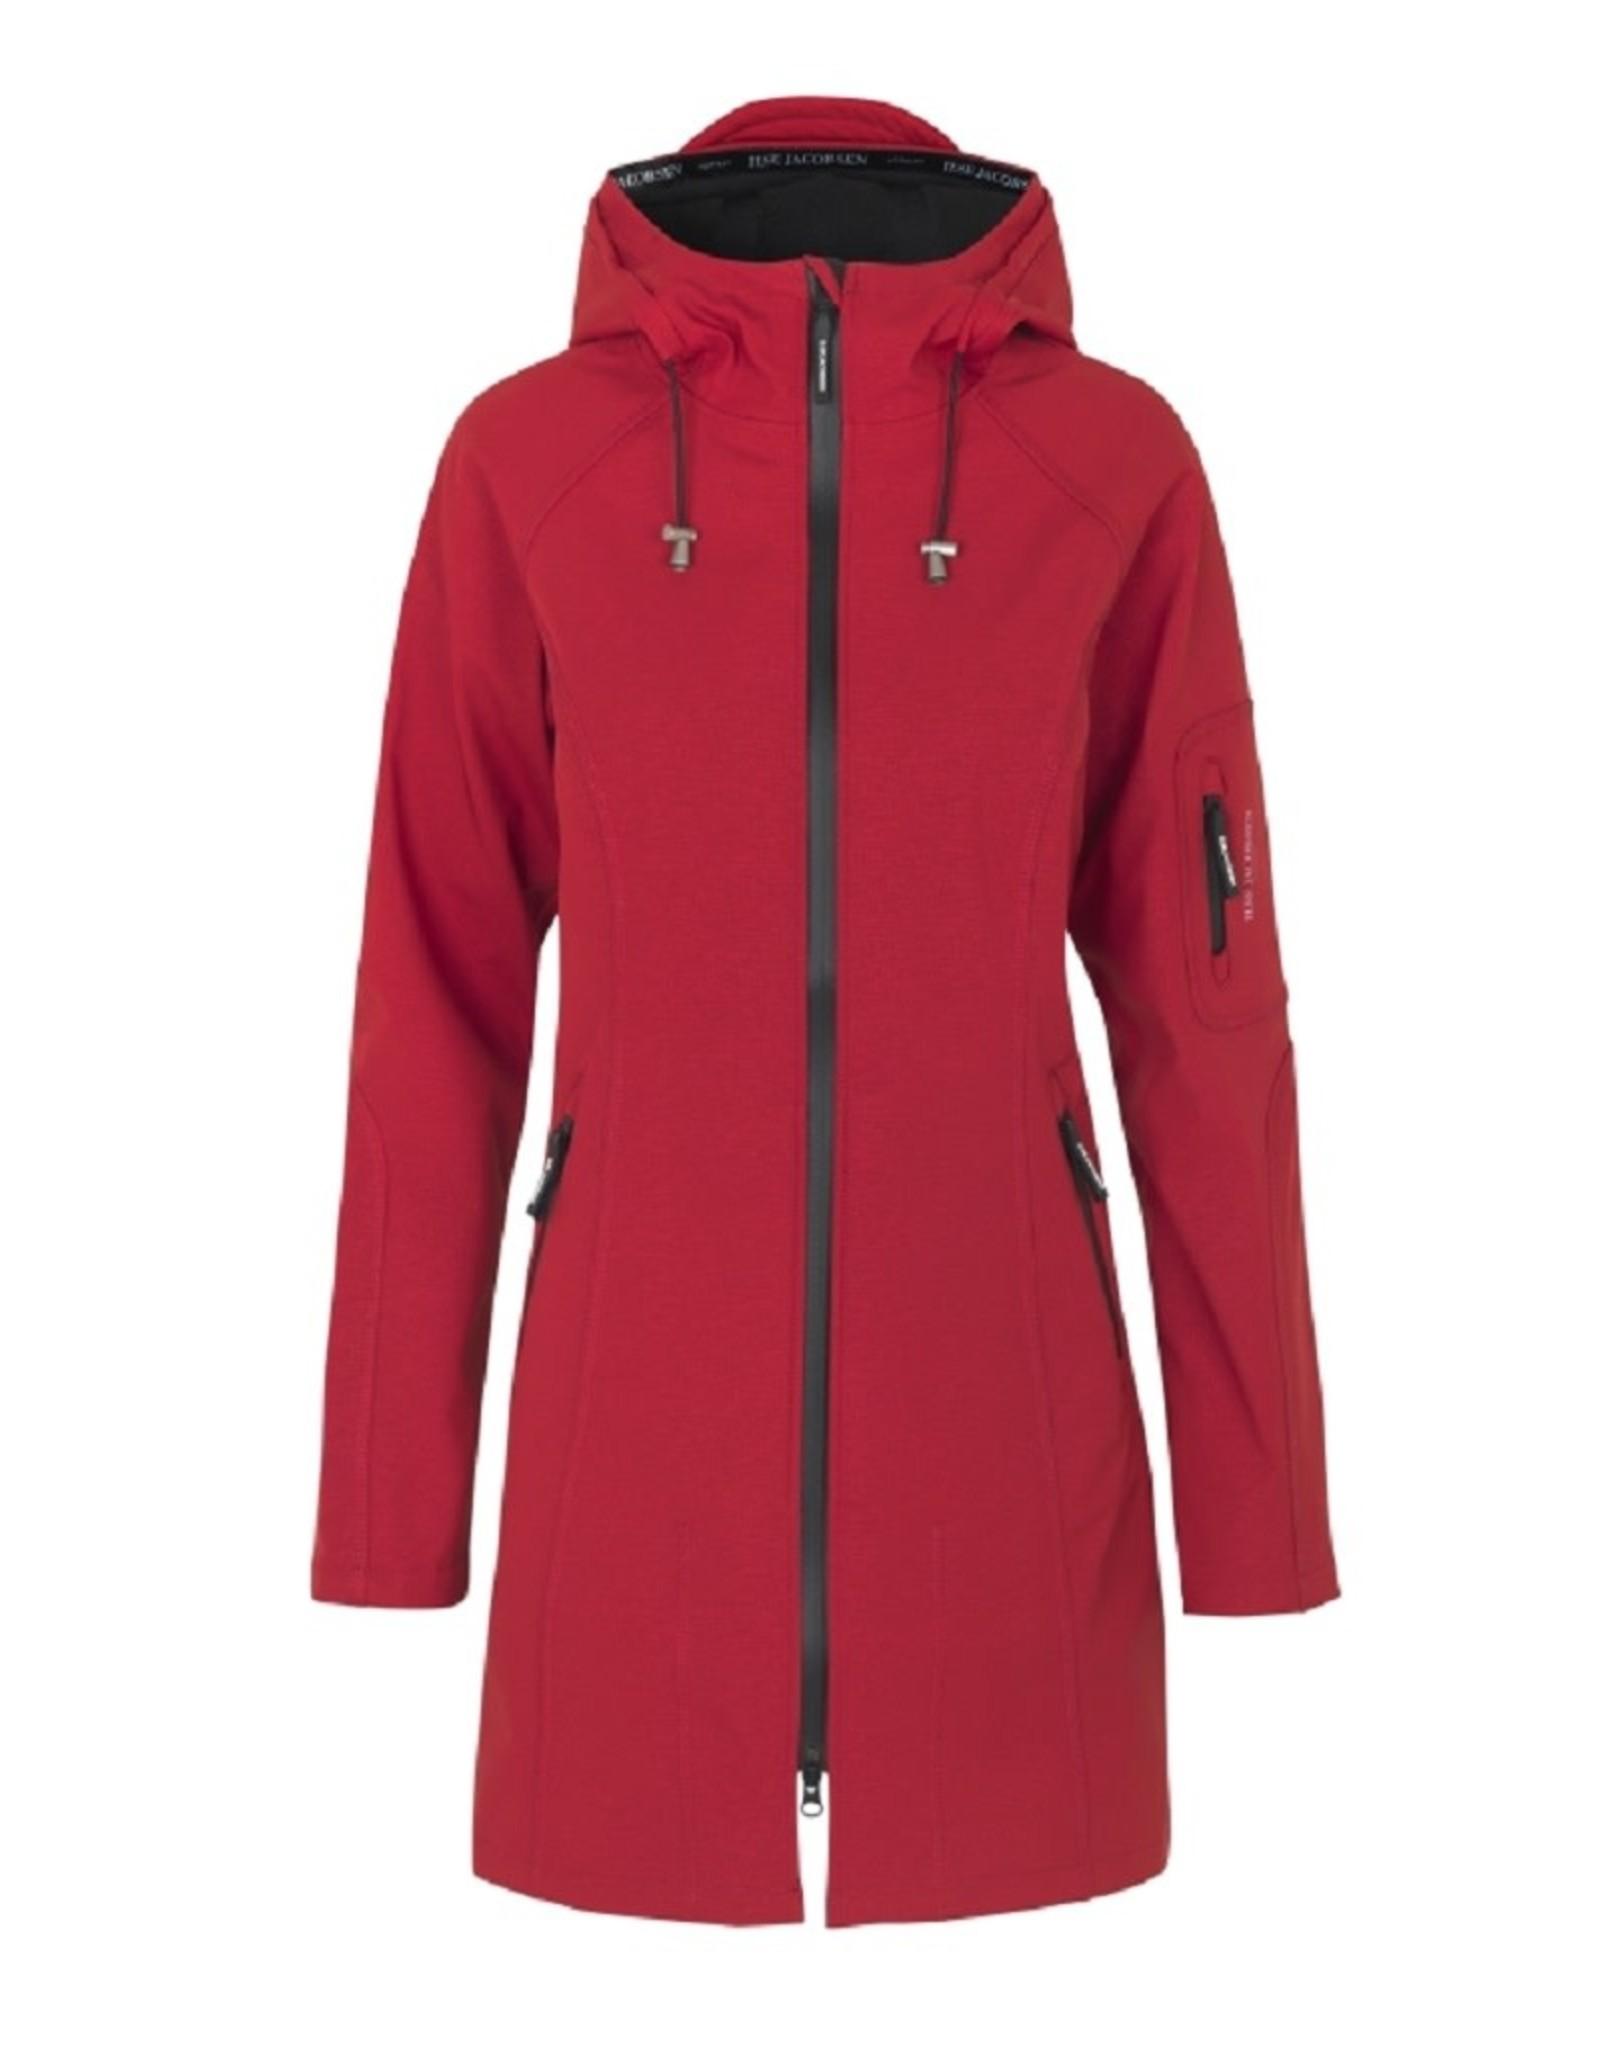 Ilse Jacobsen Ilse Jacobsen Raincoat 3/4 Rhubarb rood